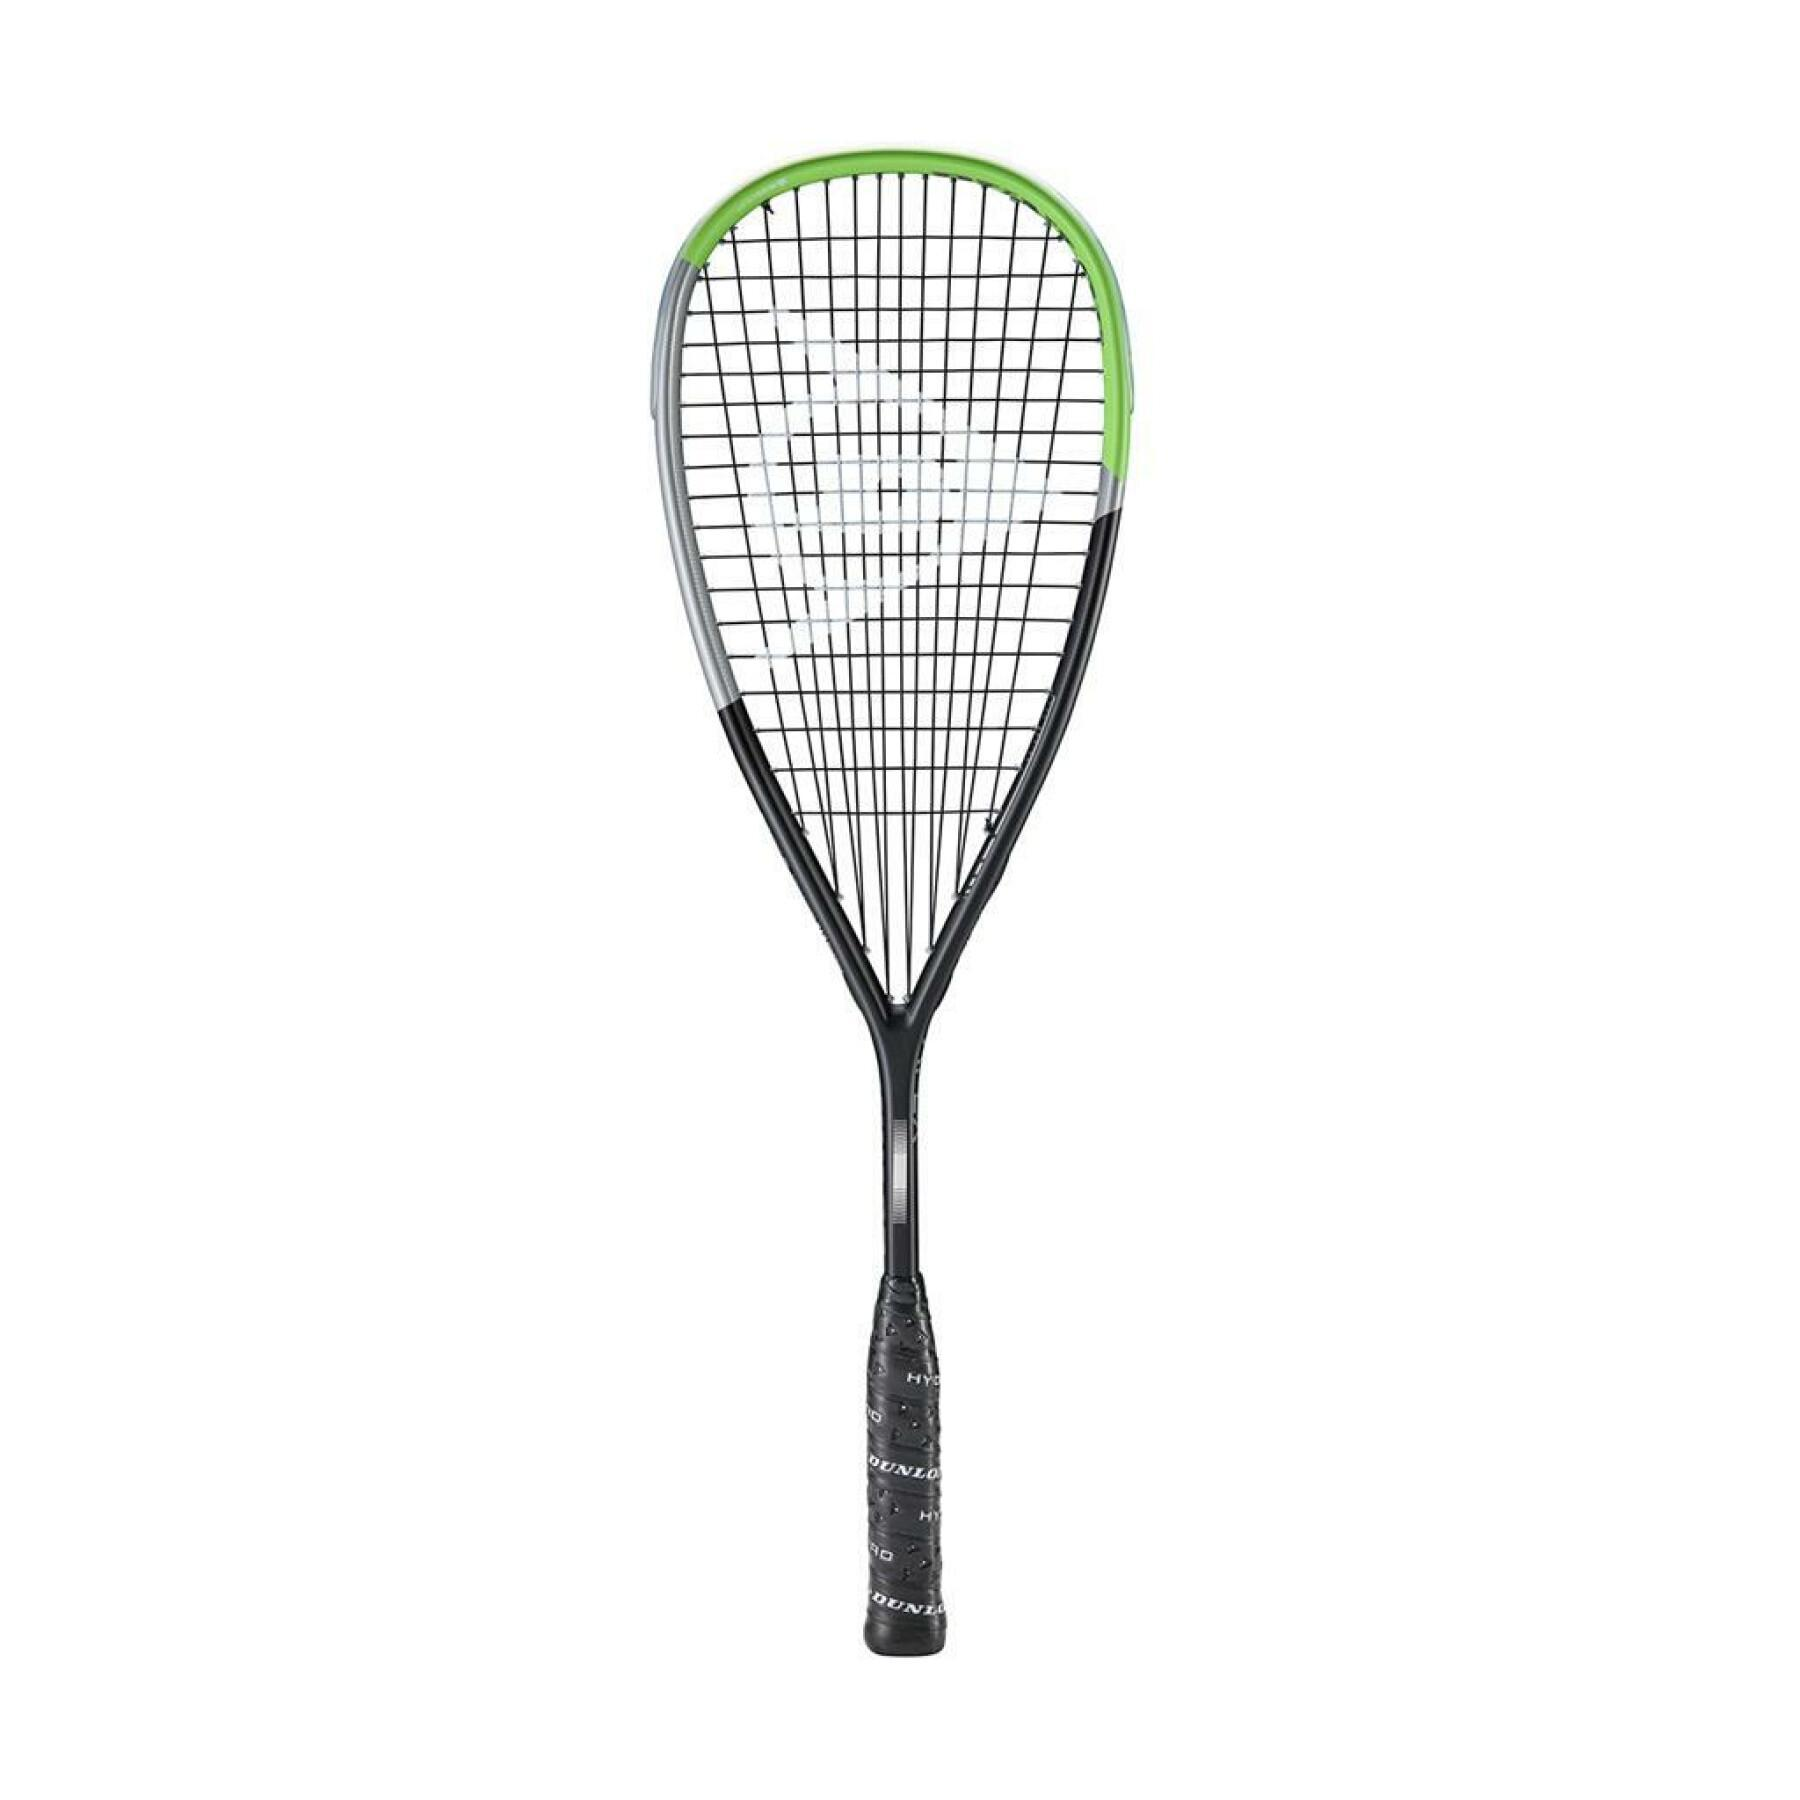 Racket Dunlop apex infinity 5.0